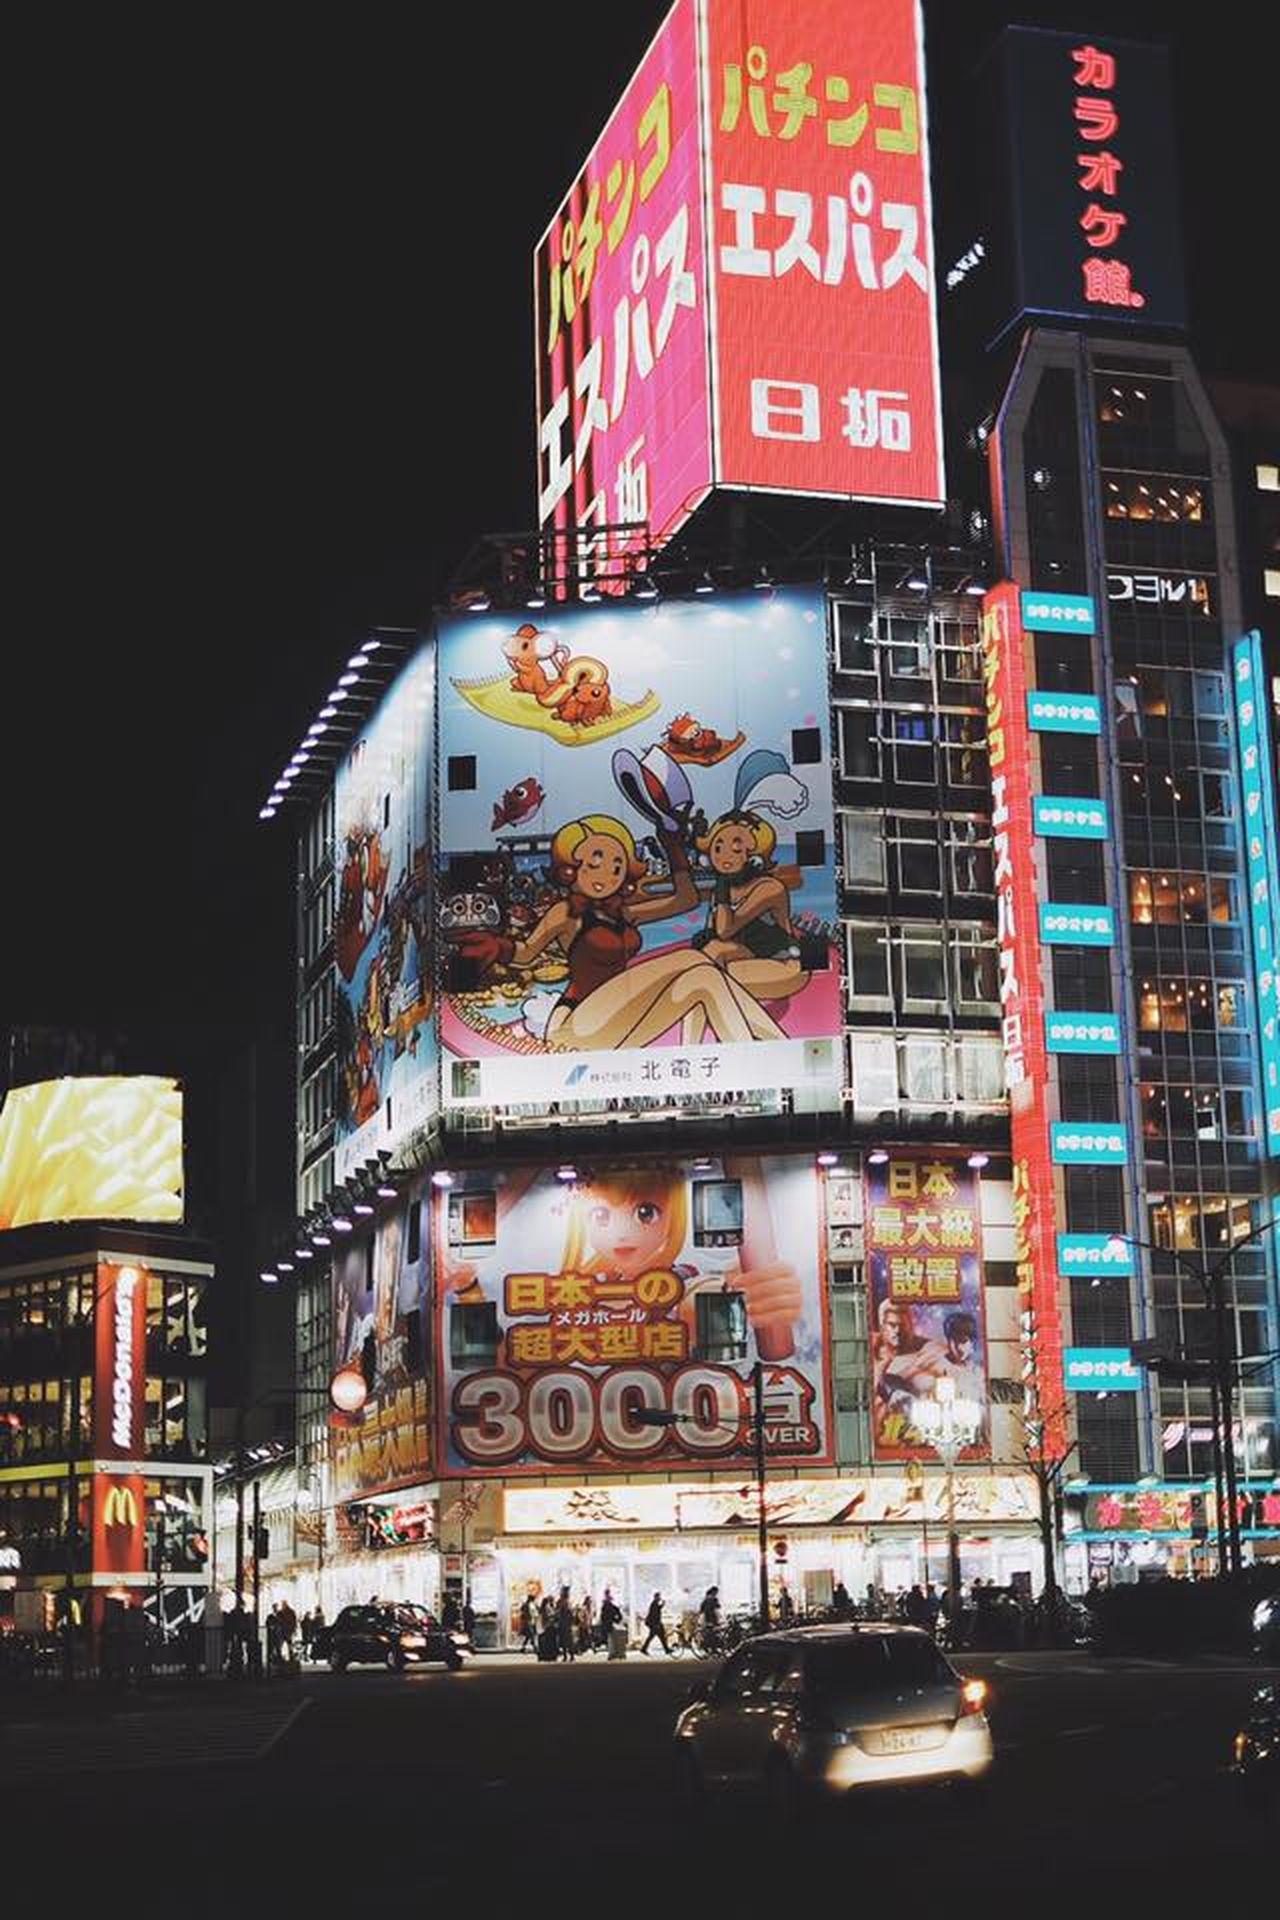 #japan #SHIBUYA #Tokyo City Night Nightlife First Eyeem Photo